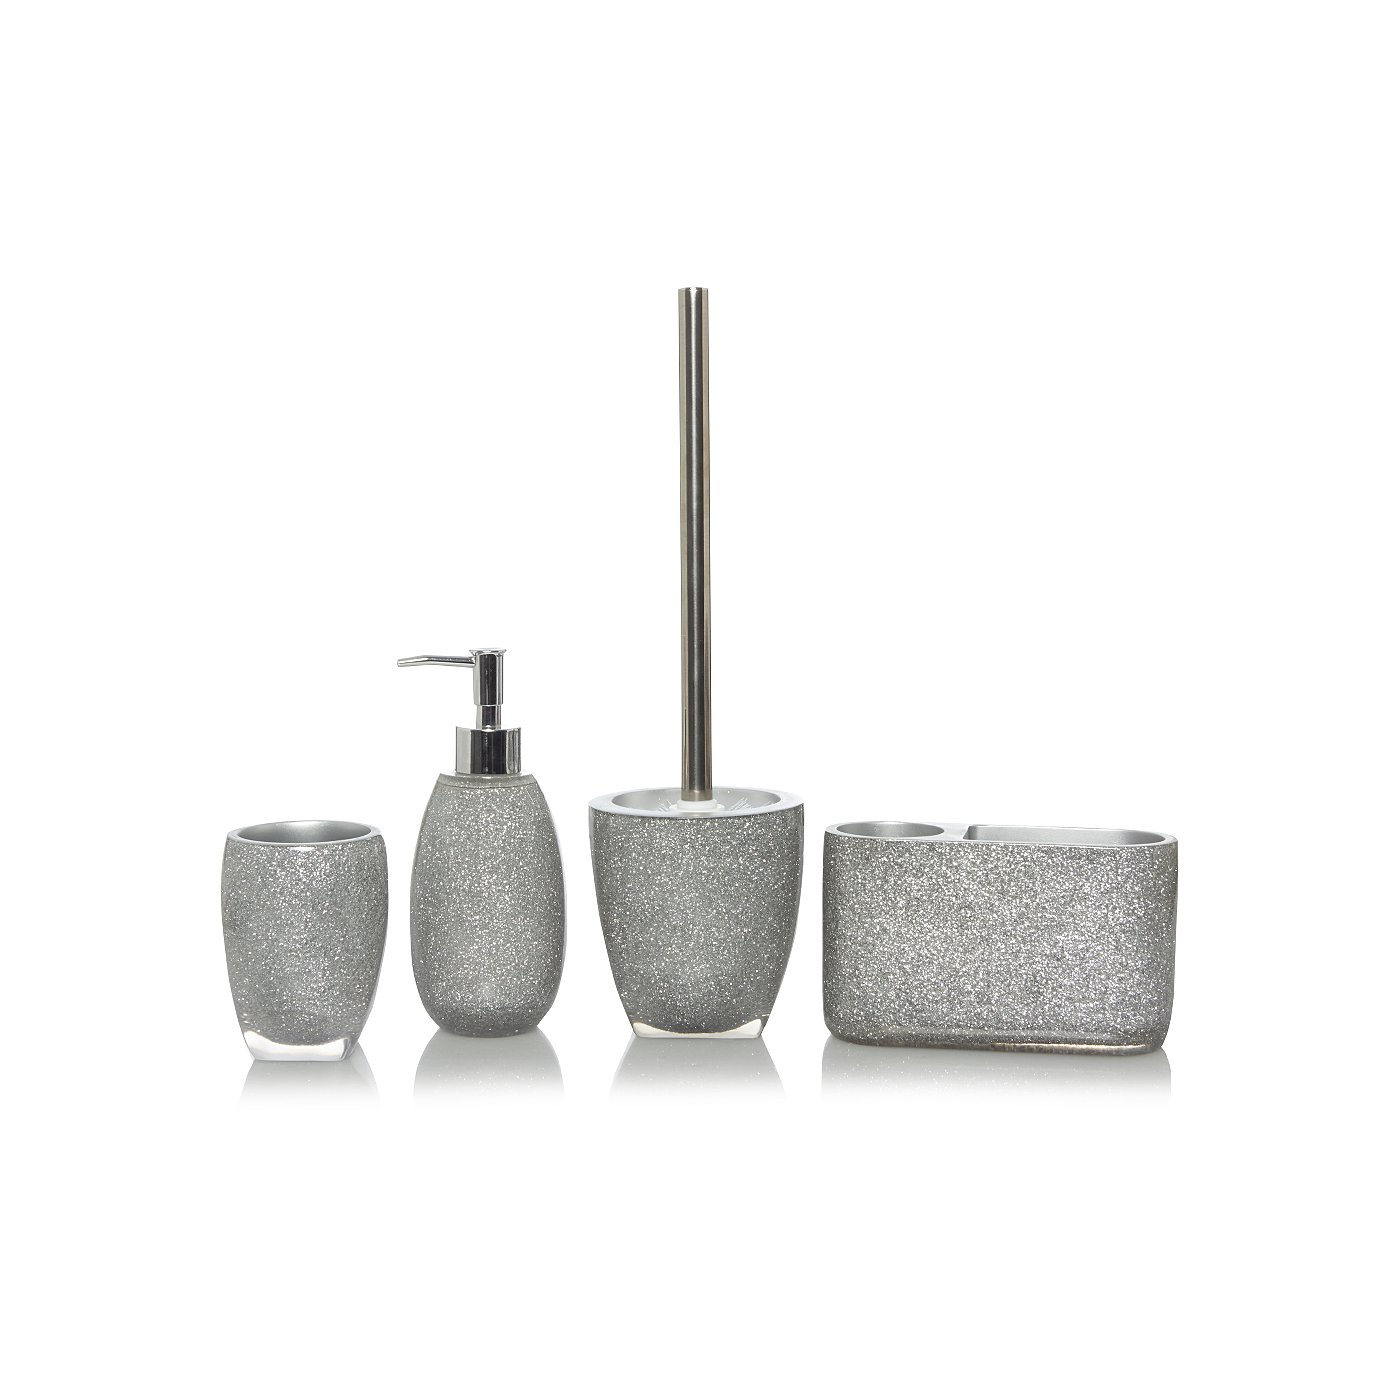 Cheap purple bathroom accessories - Silver Glitter Bath Accessories Range